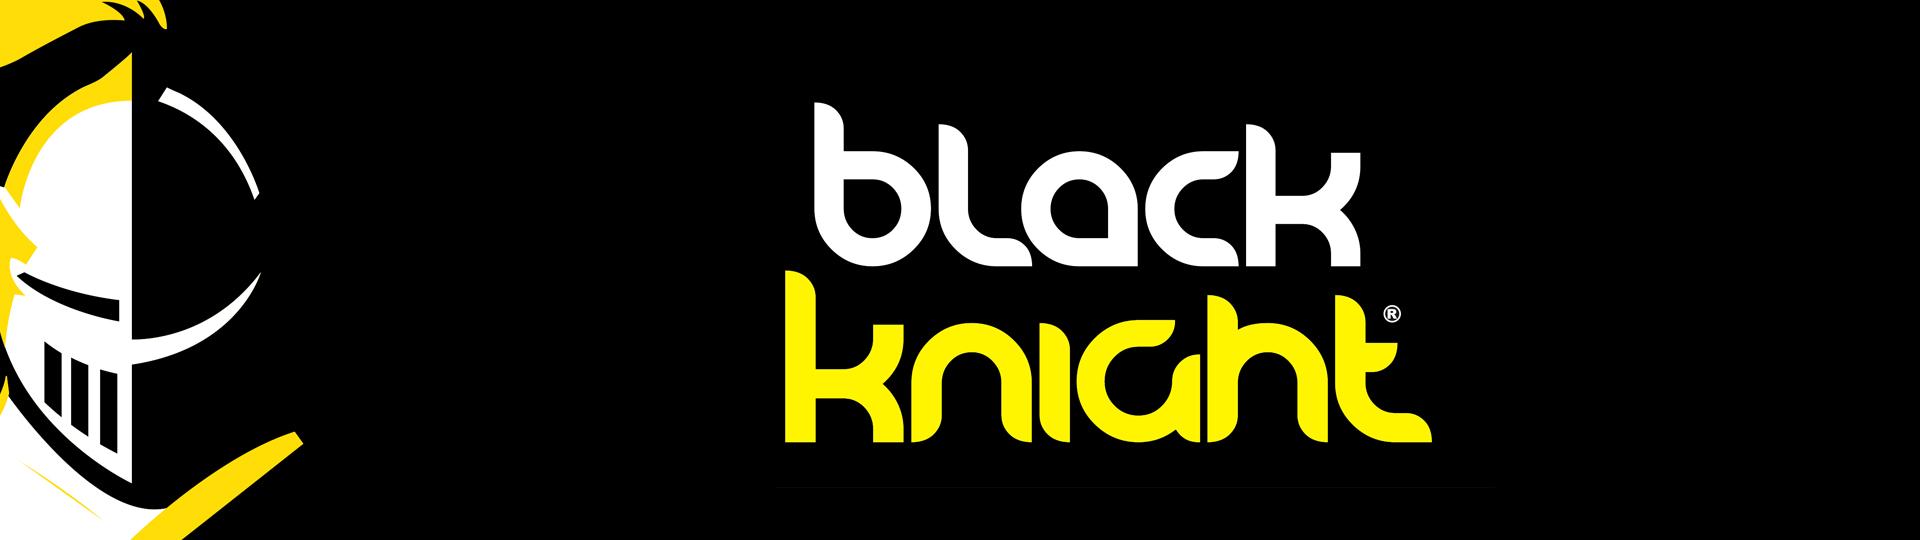 black-knight-squash-racquets-brand-banner-2021.jpg